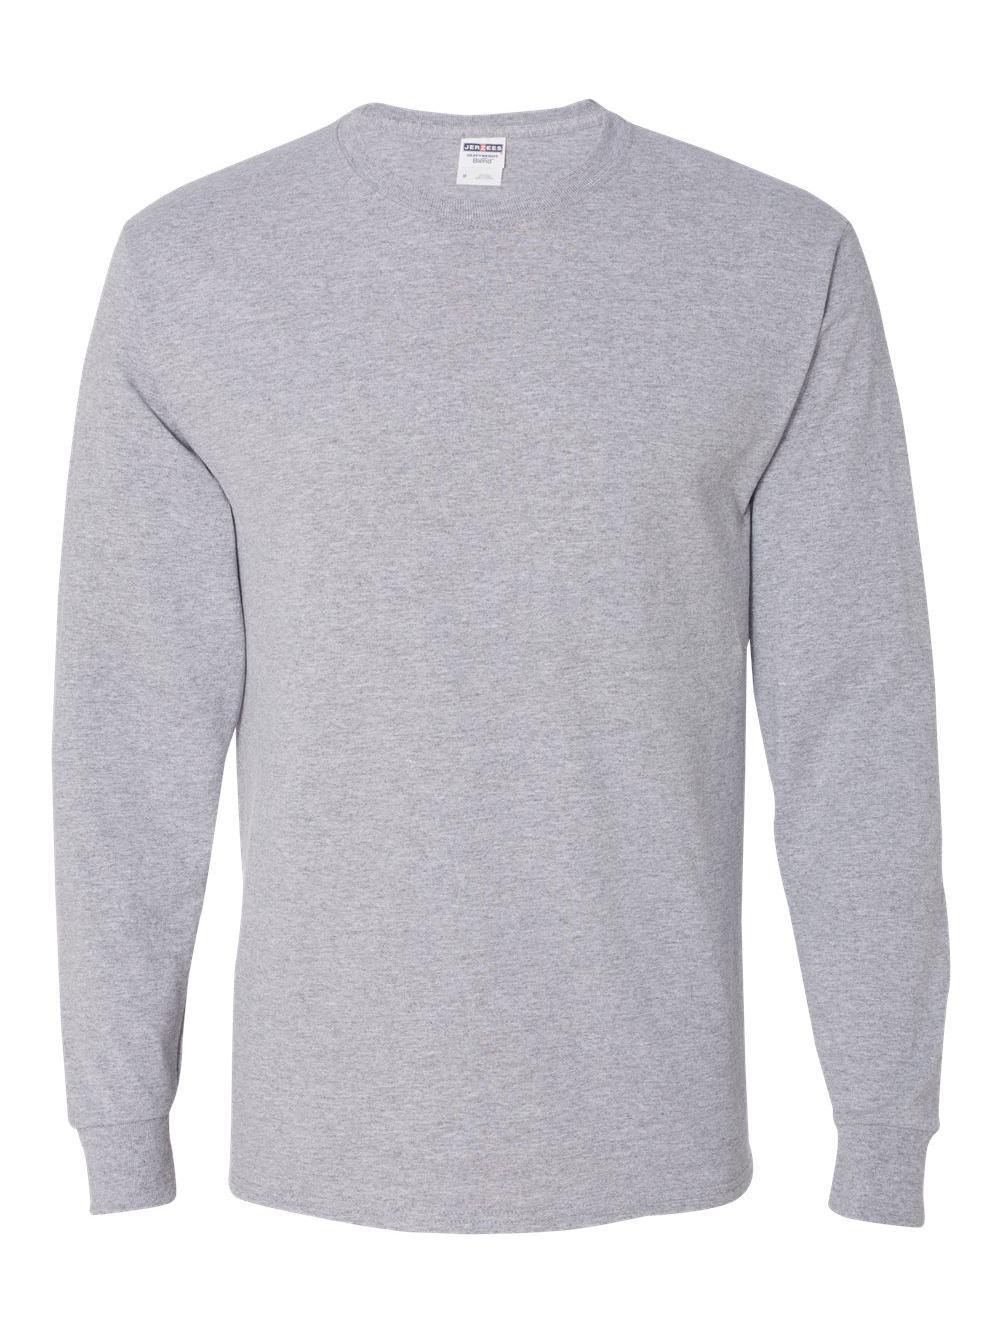 Jerzees-Dri-Power-Long-Sleeve-50-50-T-Shirt-29LSR thumbnail 6